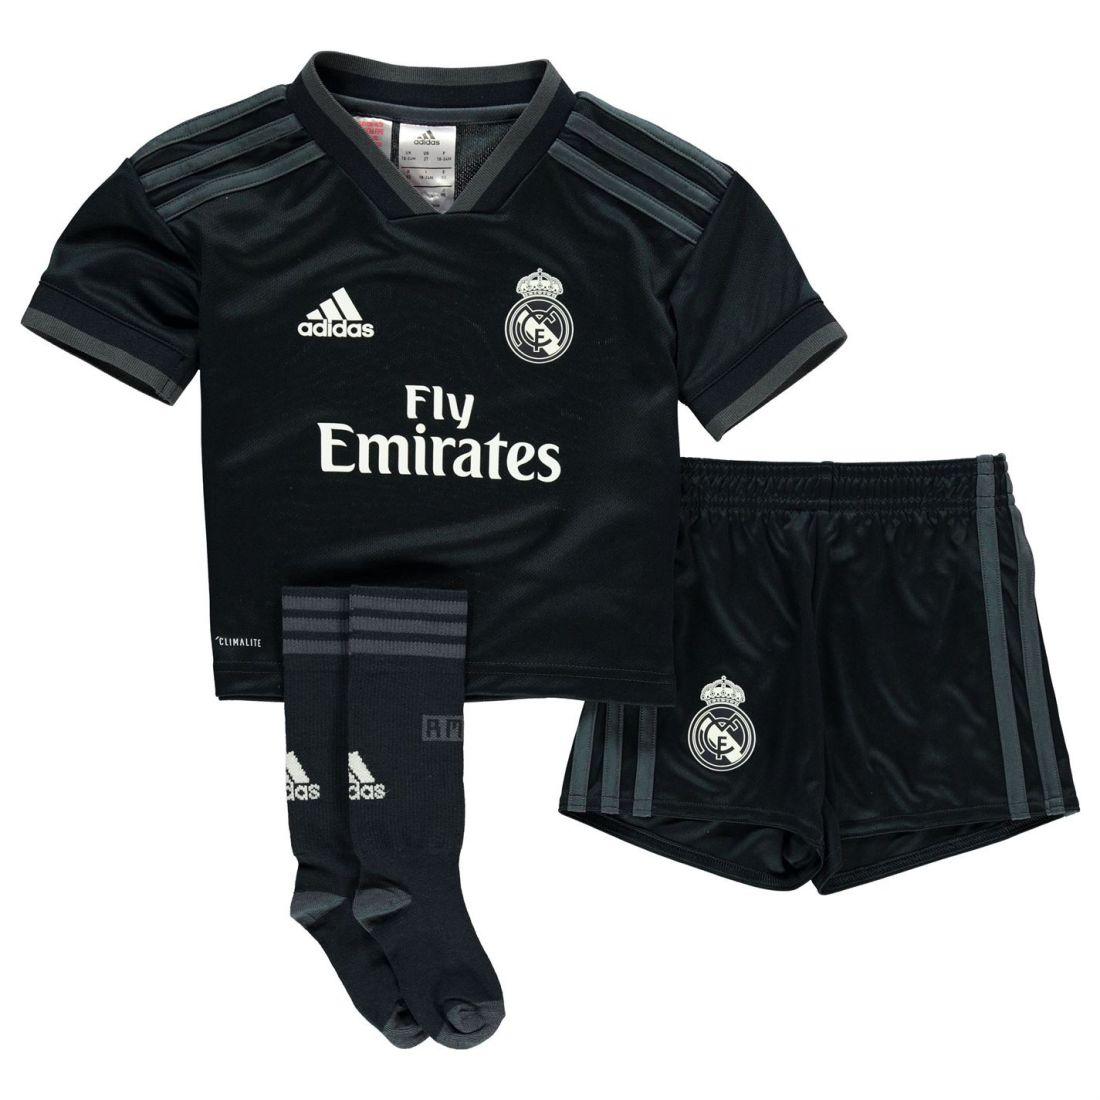 39029353d adidas Real Madrid Away Mini Kit 2018 2019 Childrens Domestic ...